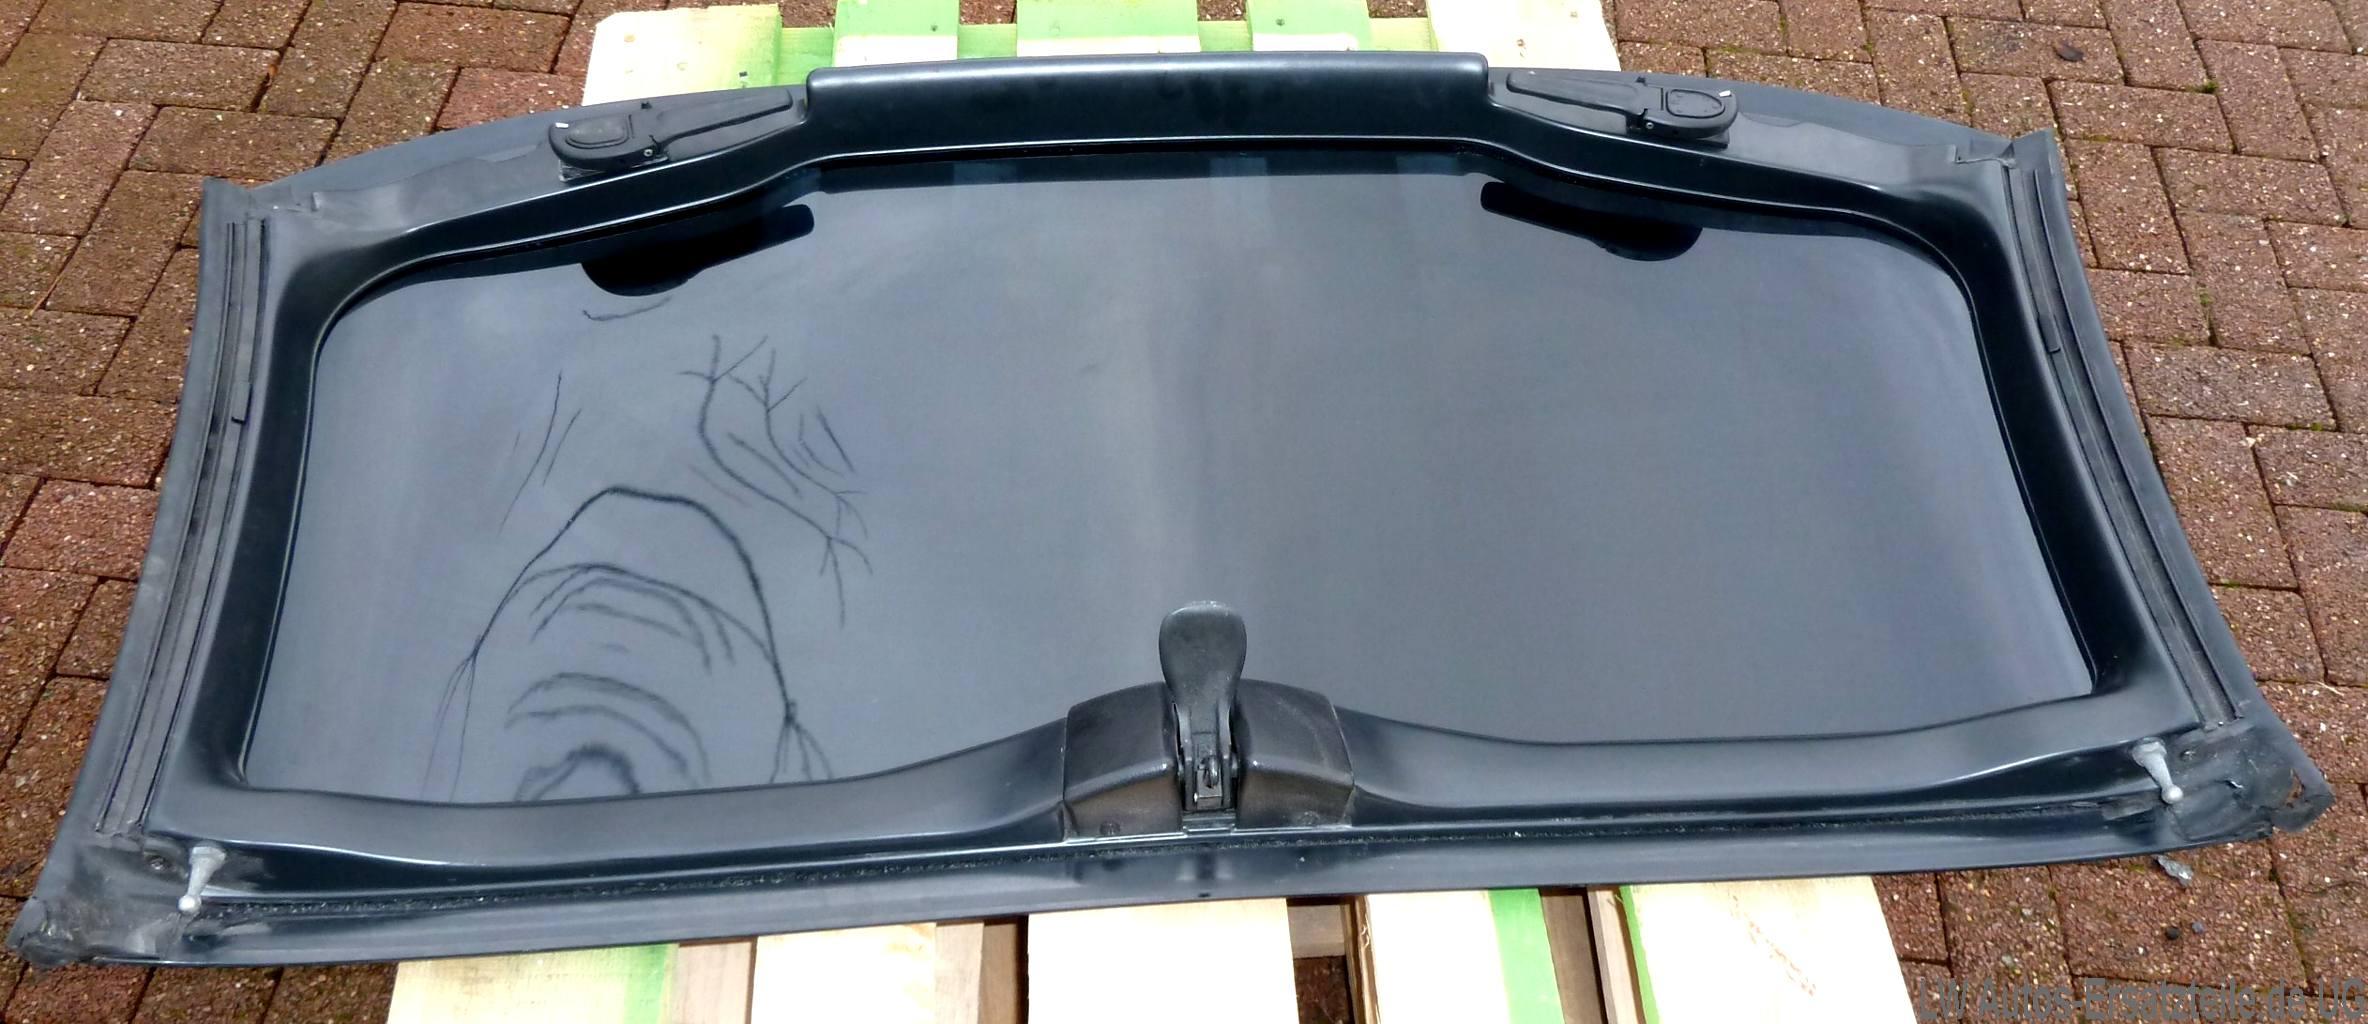 corvette c5 targa glasdach glas targadach ebay. Black Bedroom Furniture Sets. Home Design Ideas